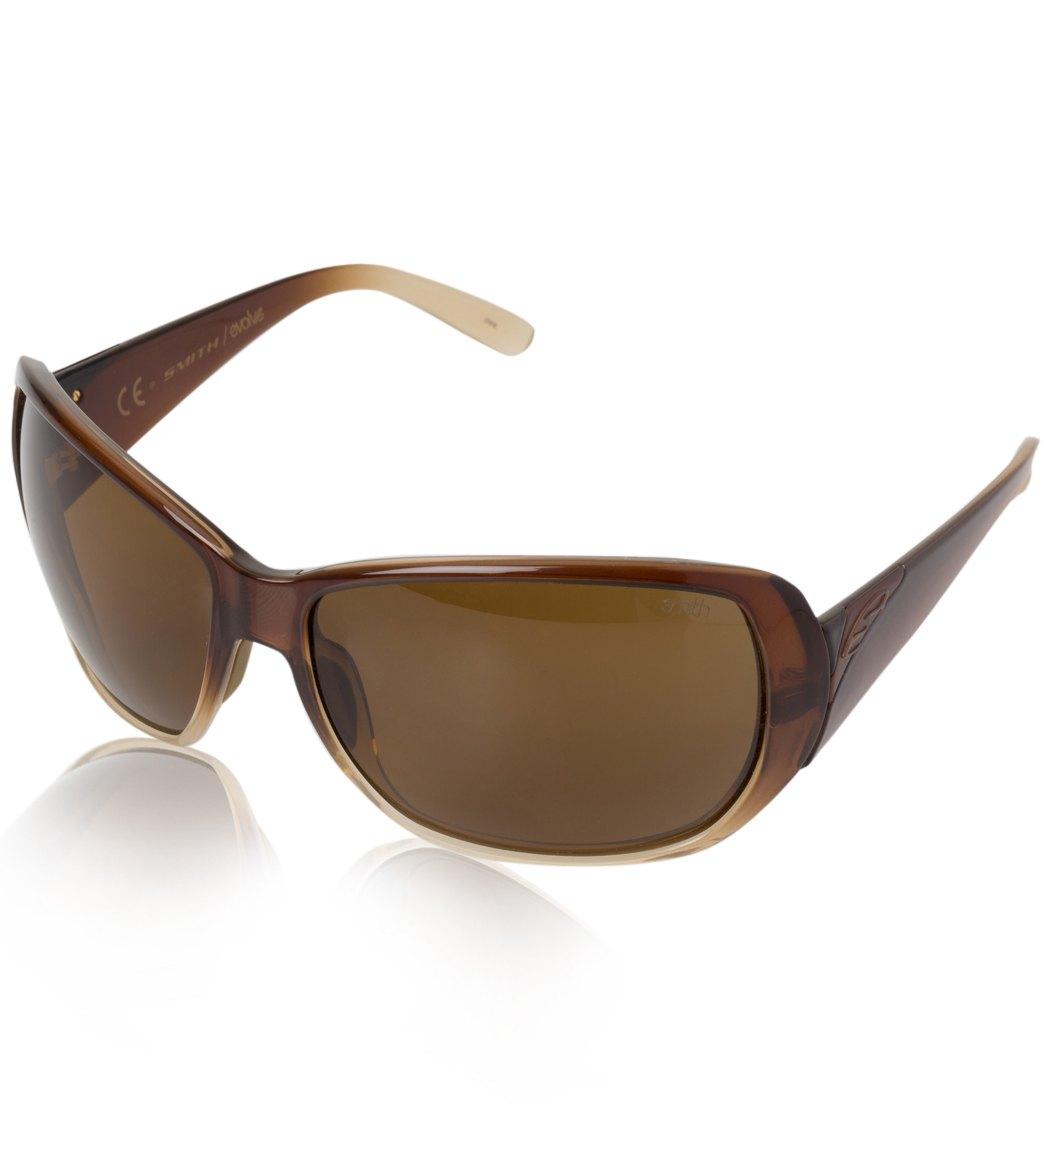 b9790a0efb148 Smith Optics Women s Hemline Sunglasses at SwimOutlet.com - Free Shipping